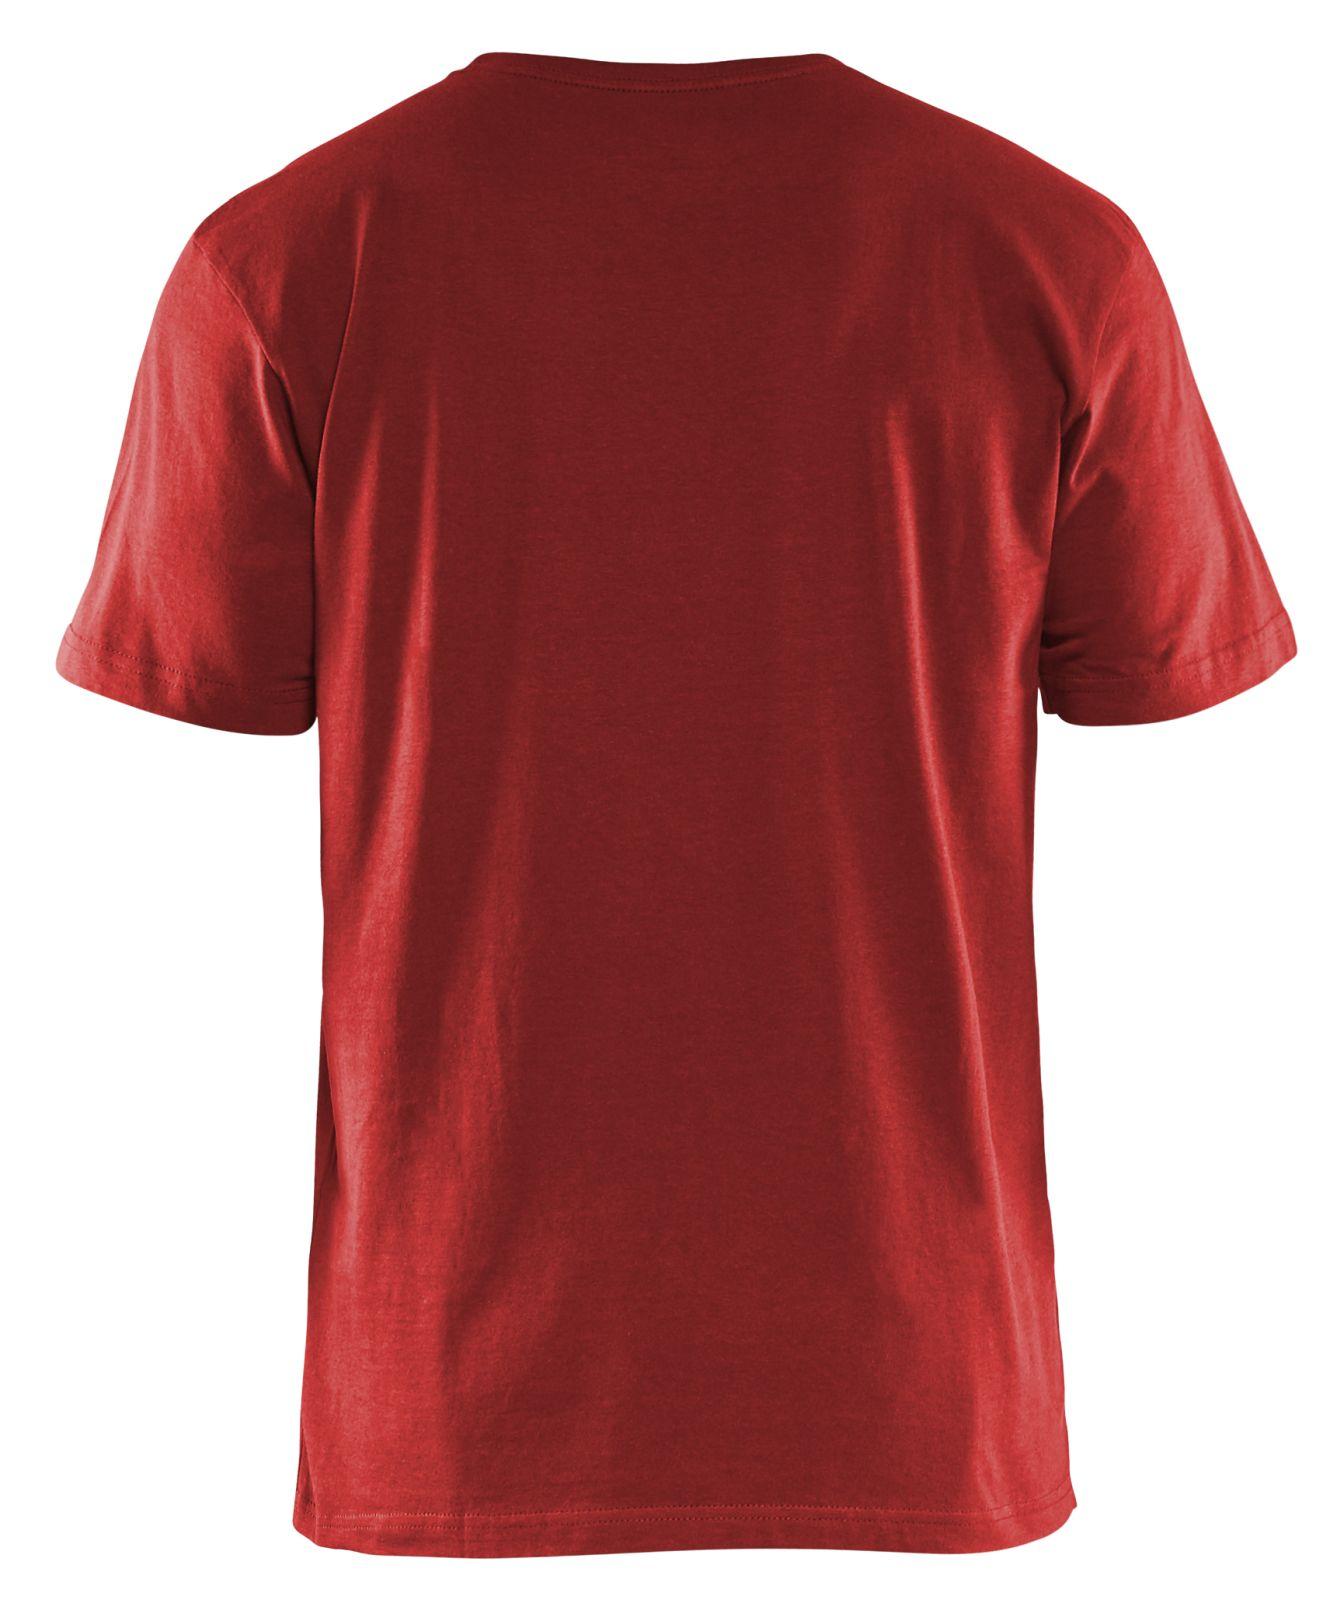 Blaklader T-shirts 35251042 rood(5600)